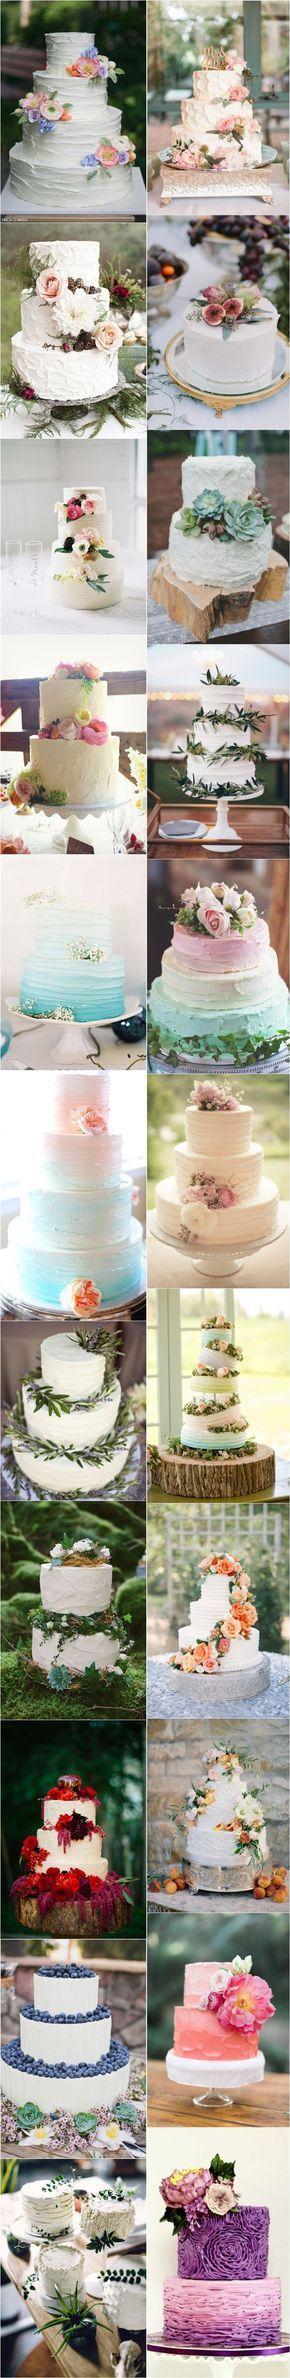 22 unqiue buttercream wedding cakes - Deer Pearl Flowers